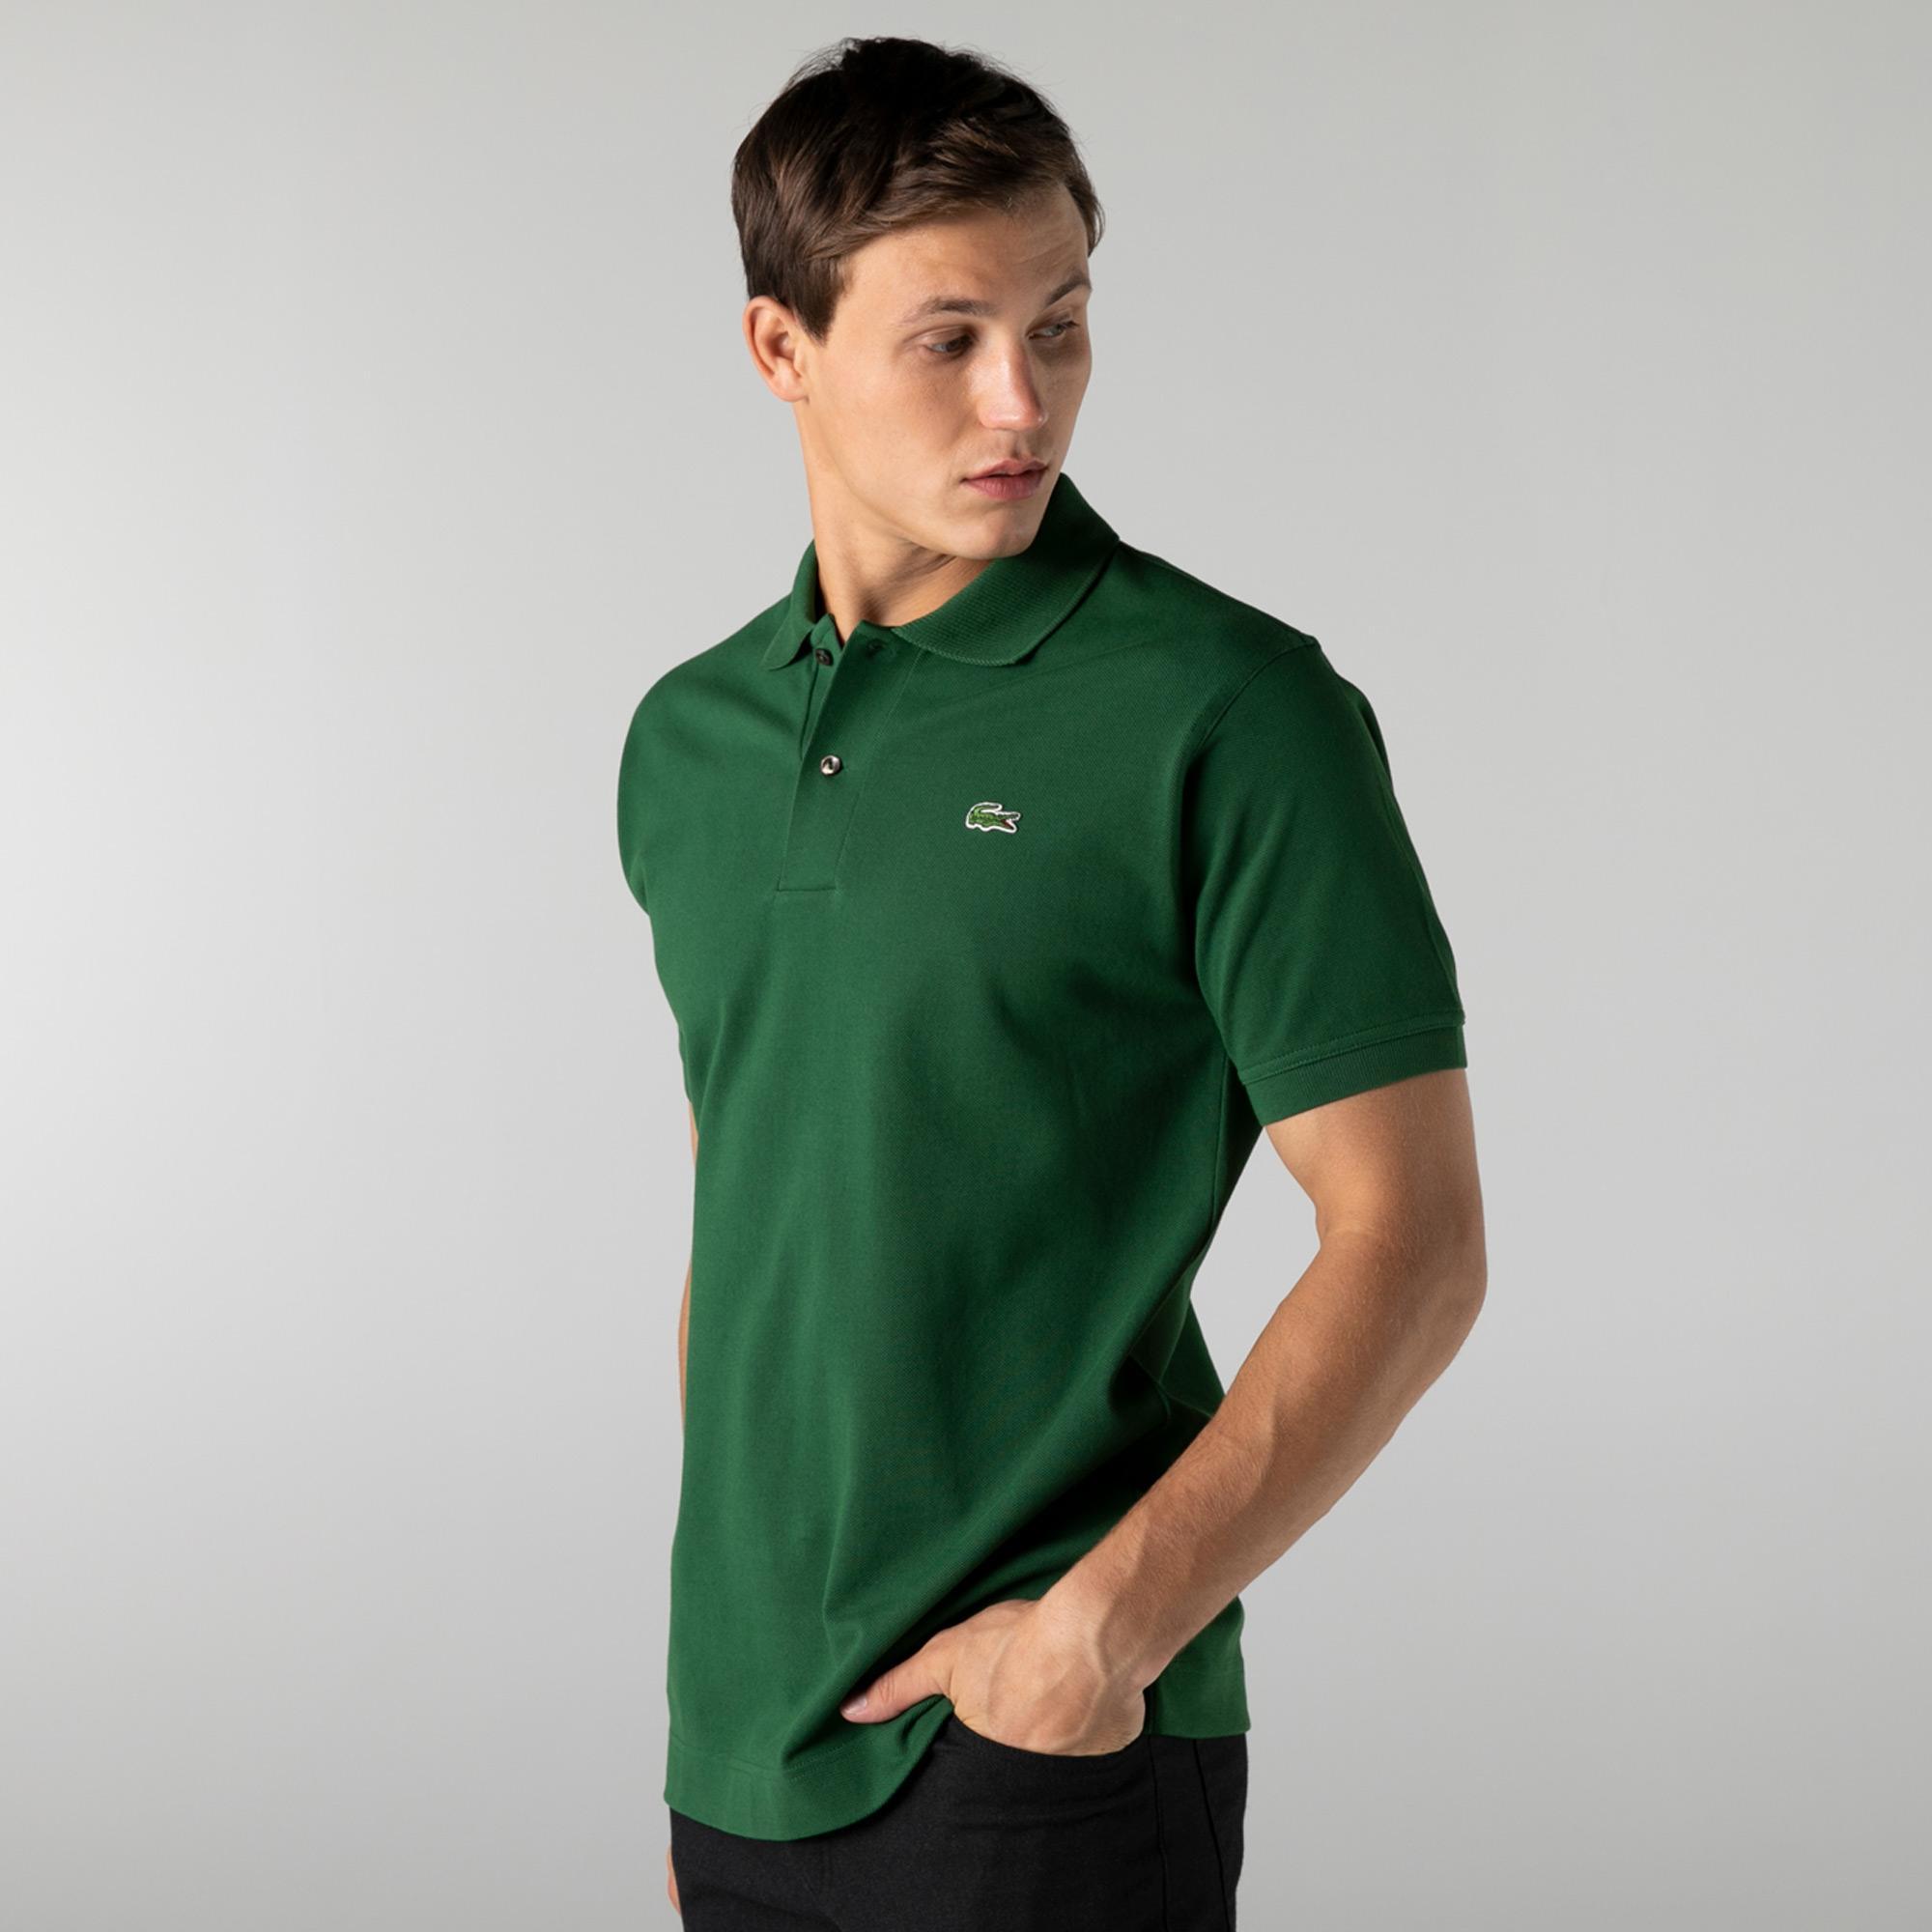 Lacoste Erkek Classic Fit Organik Pamuk Yeşil Polo